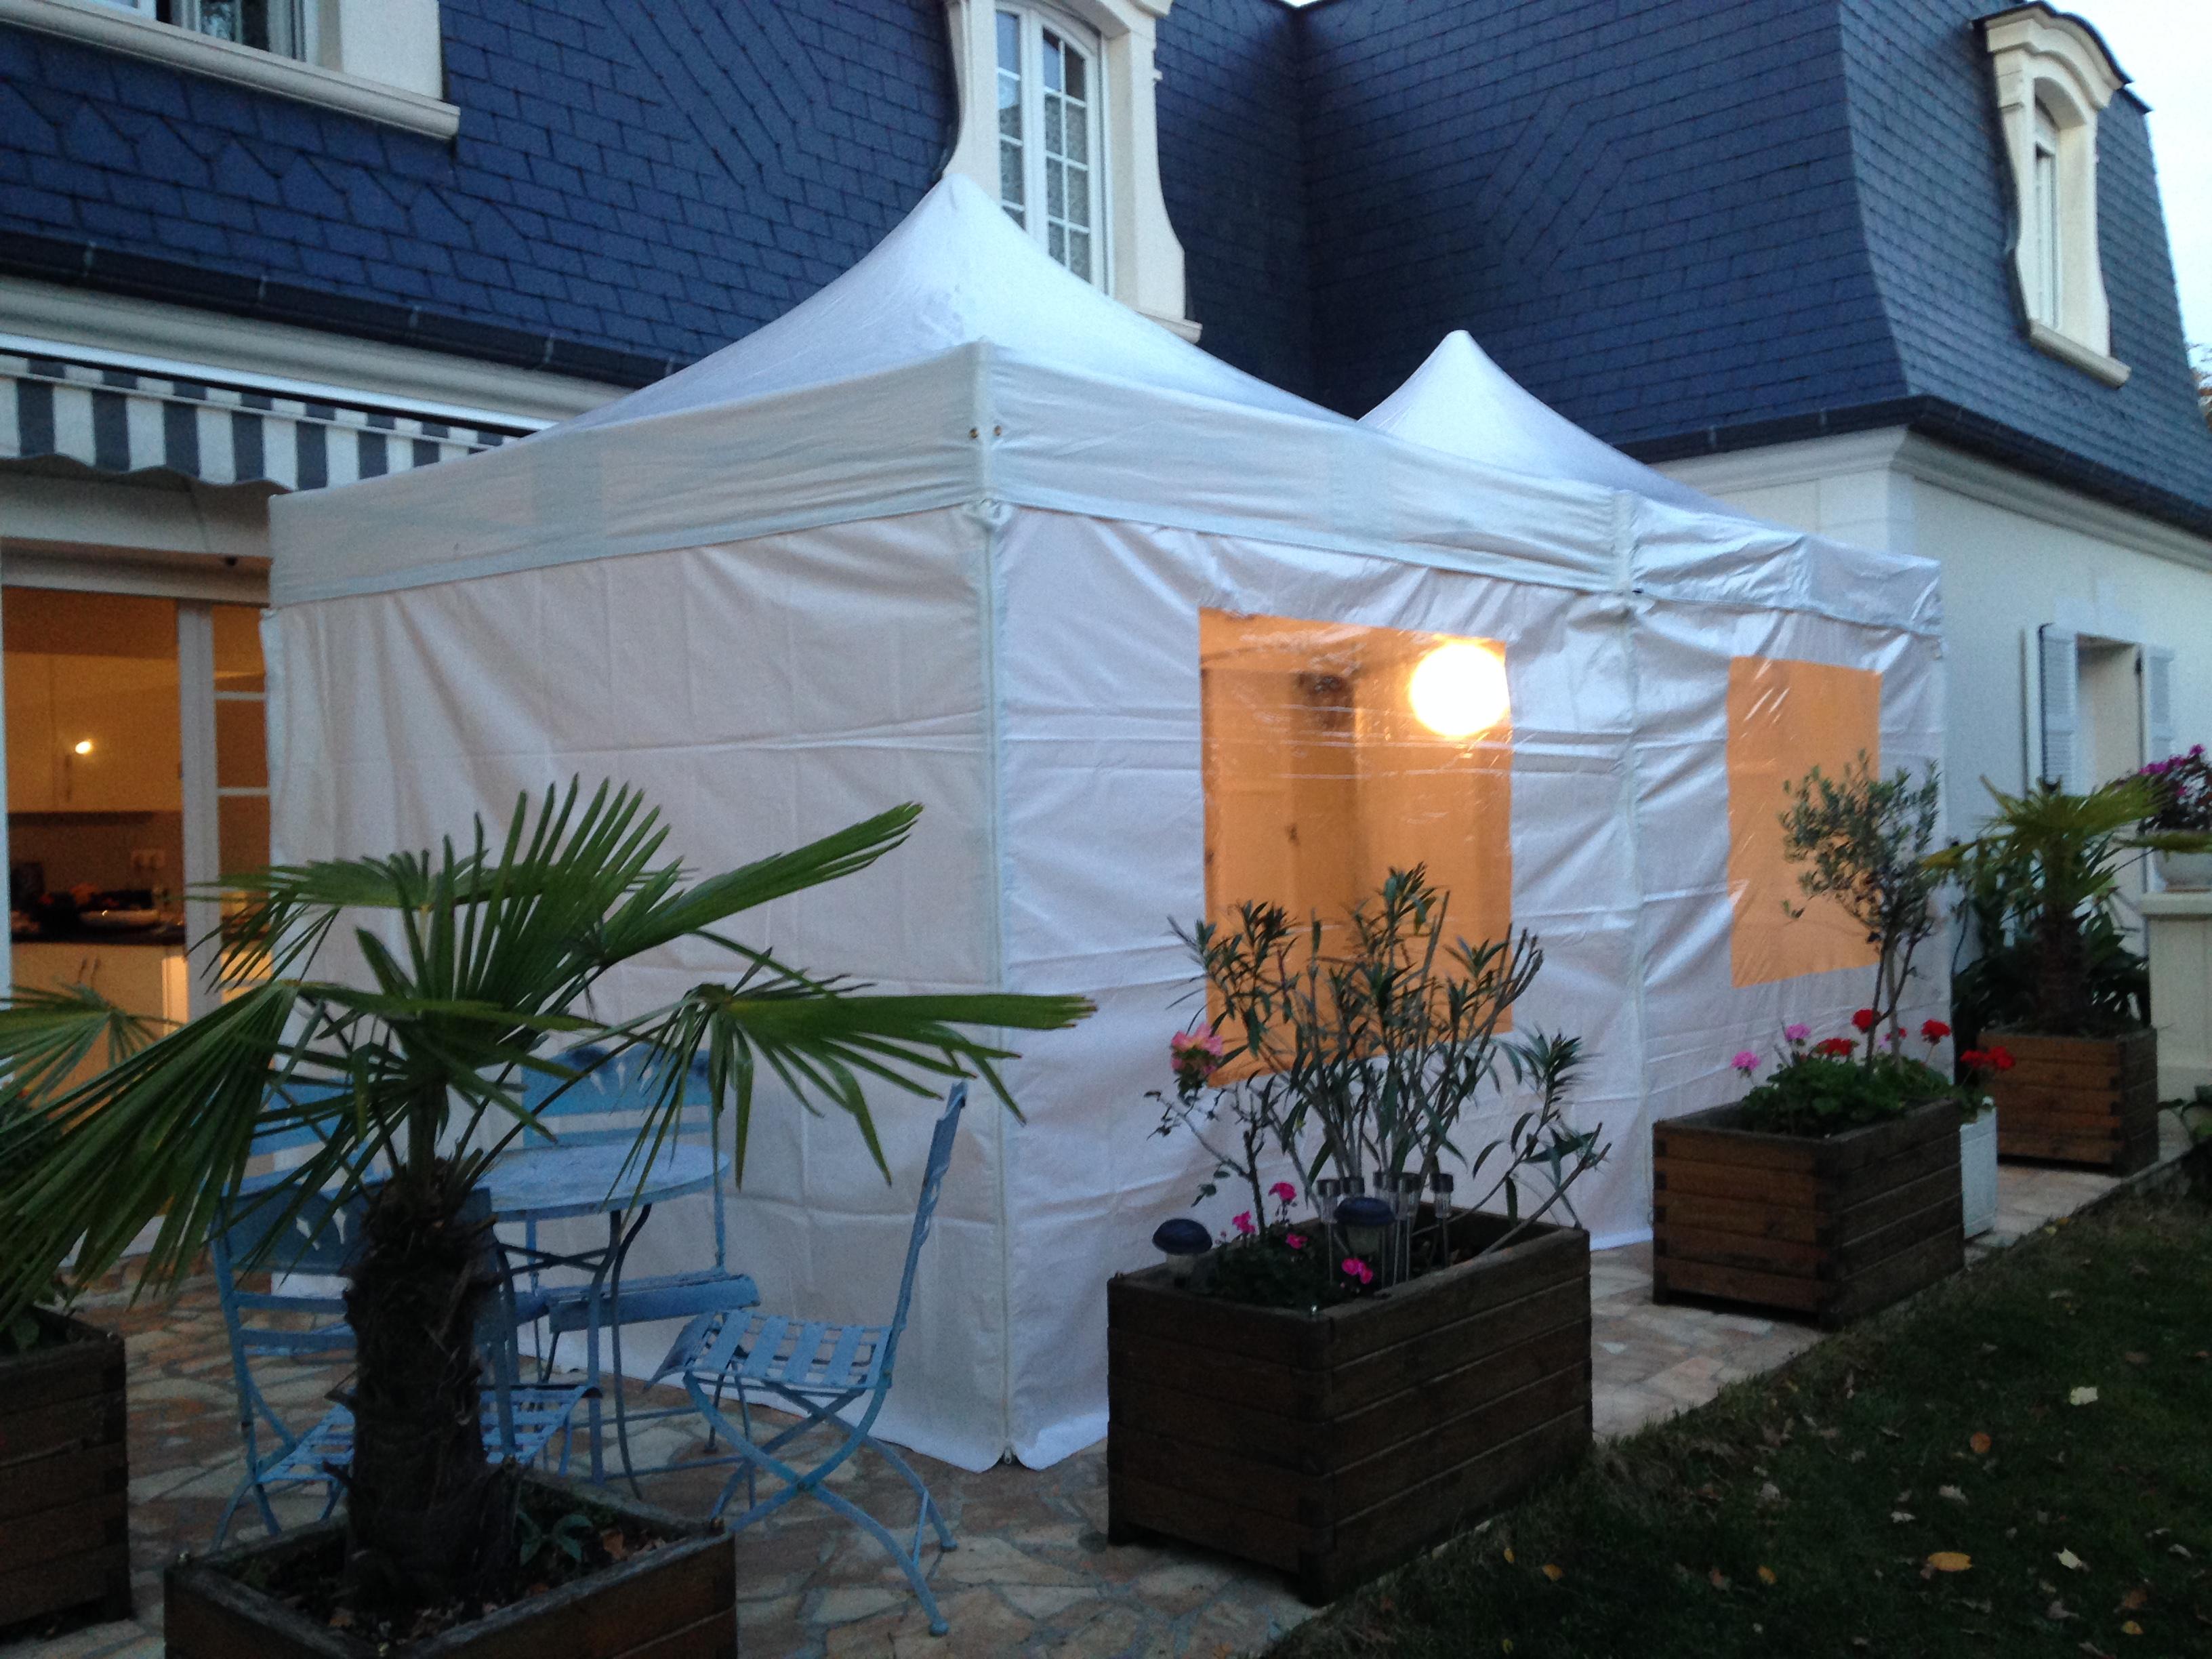 Location de 2 tentes 3x3 - Ile de France